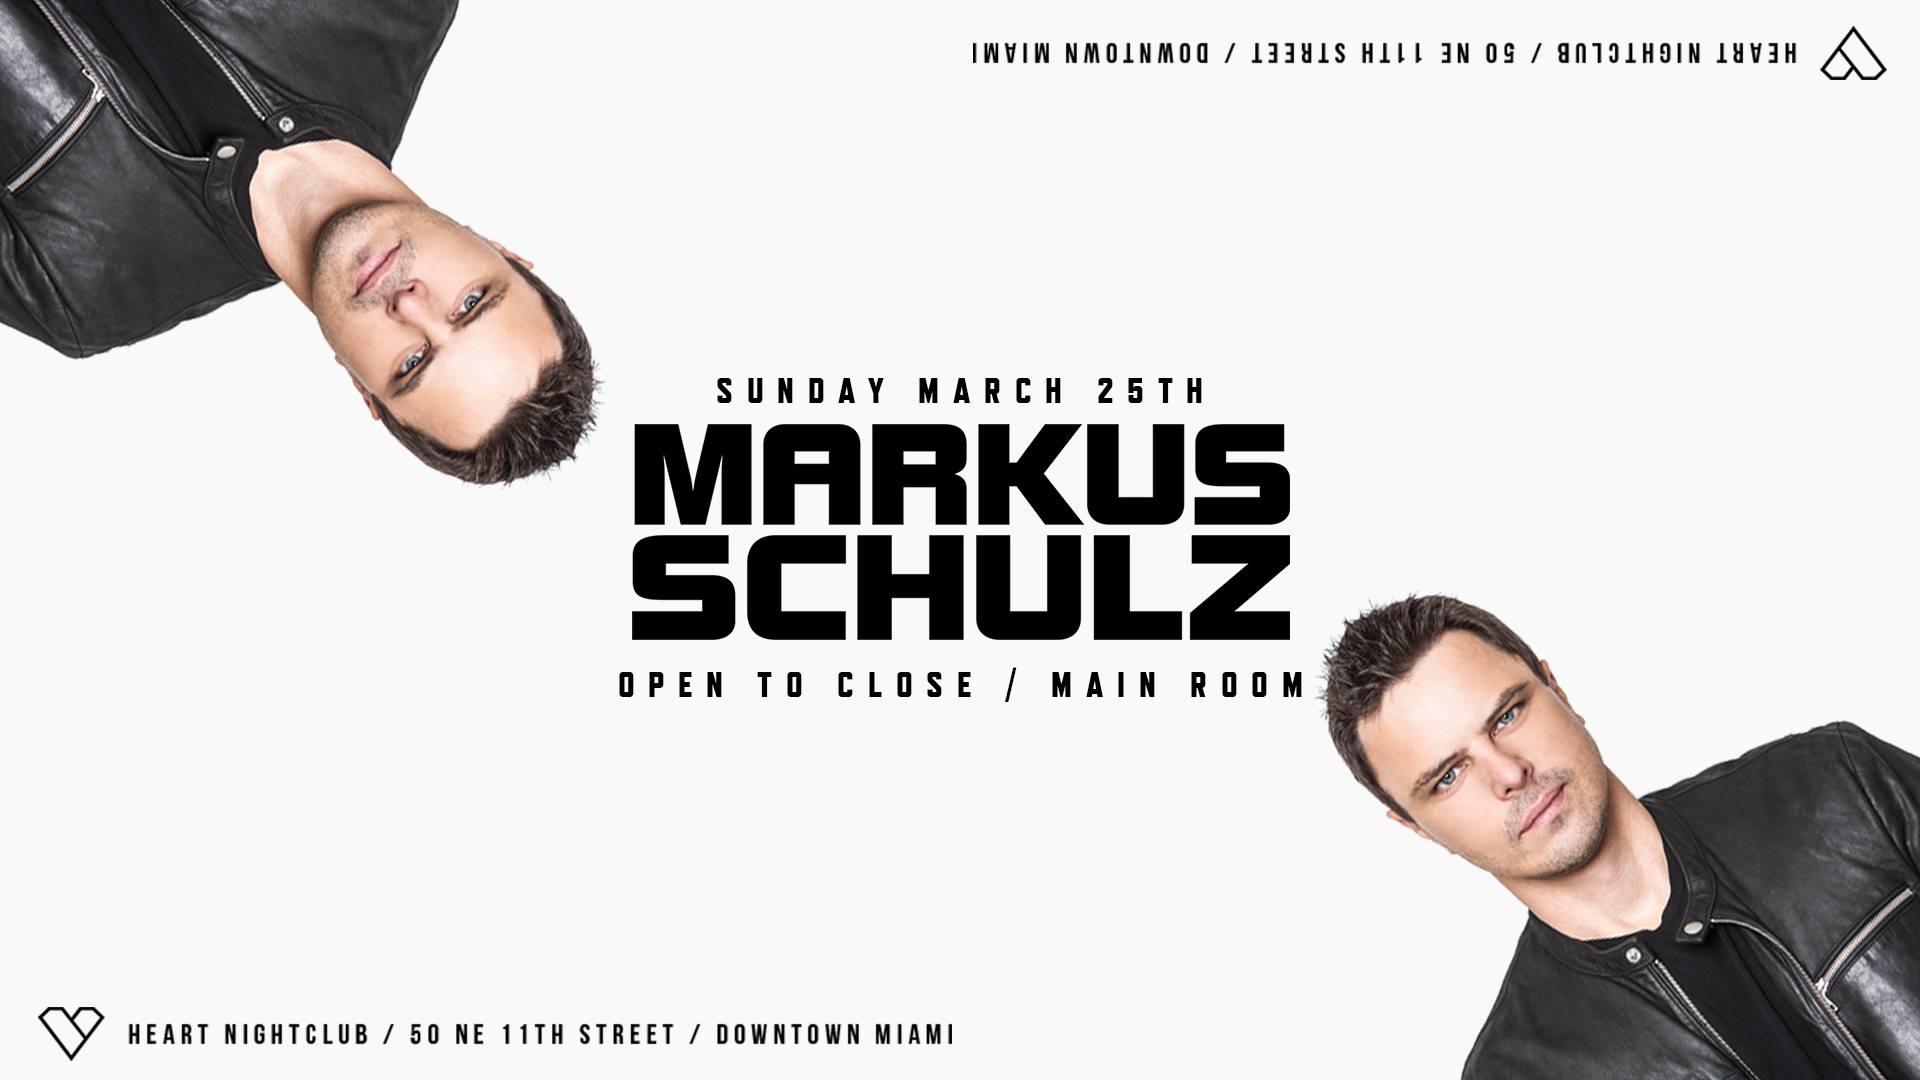 Markus Schulz Open To Close - Main Room Marathon Image